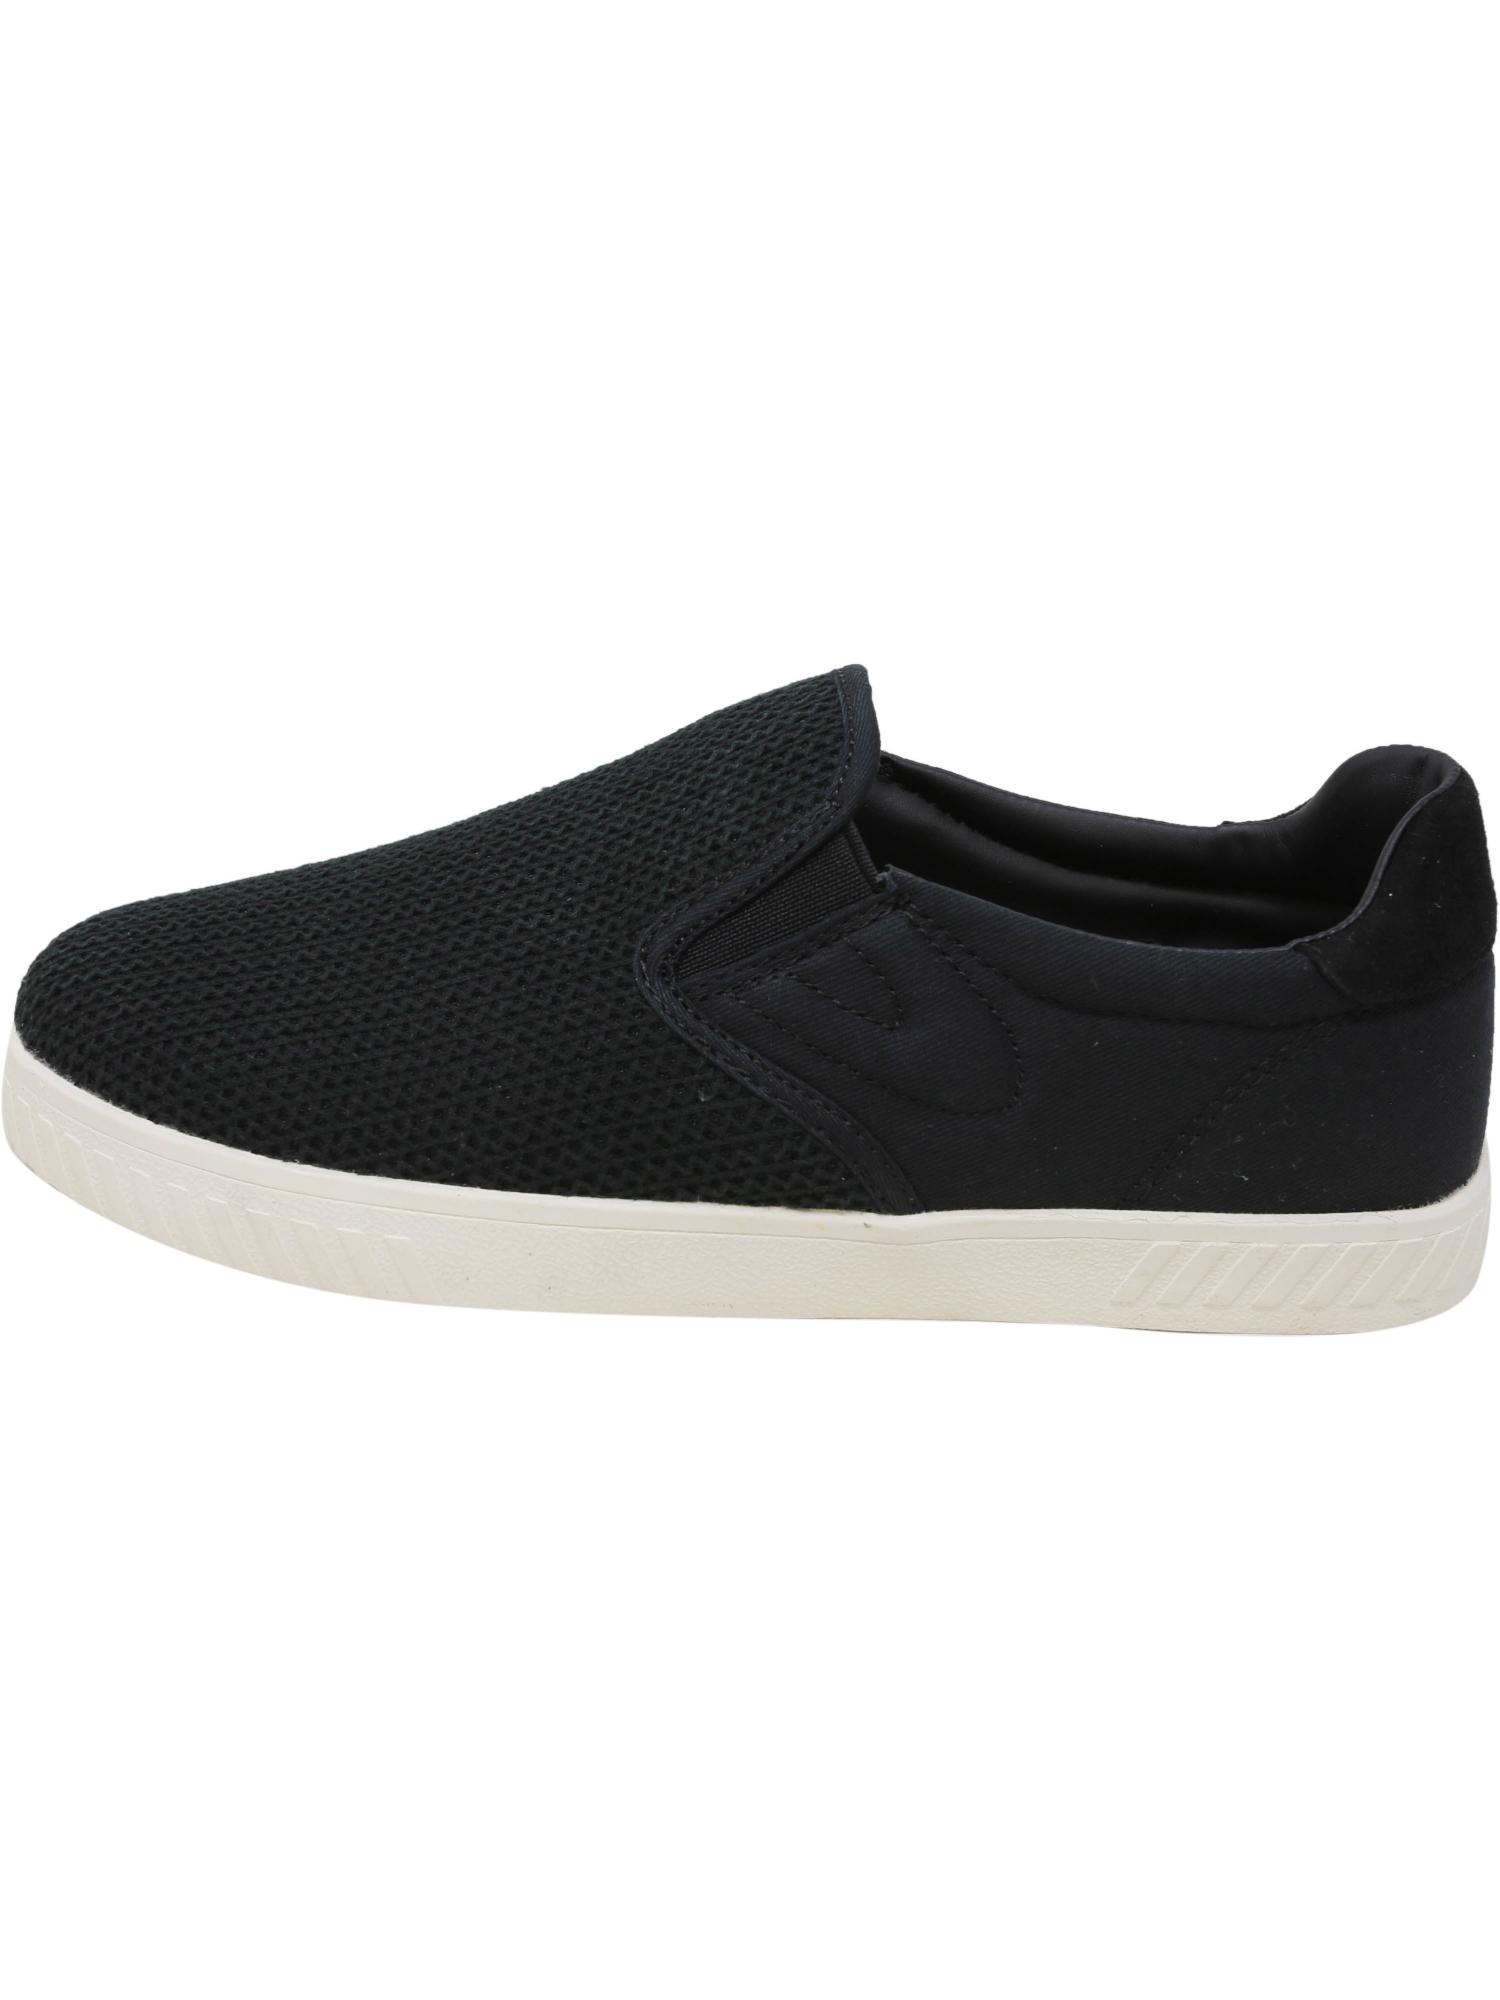 Tretorn-Femmes-Cruz-tissu-aux-chevilles-Haute-Slip-Chaussures-en miniature 6